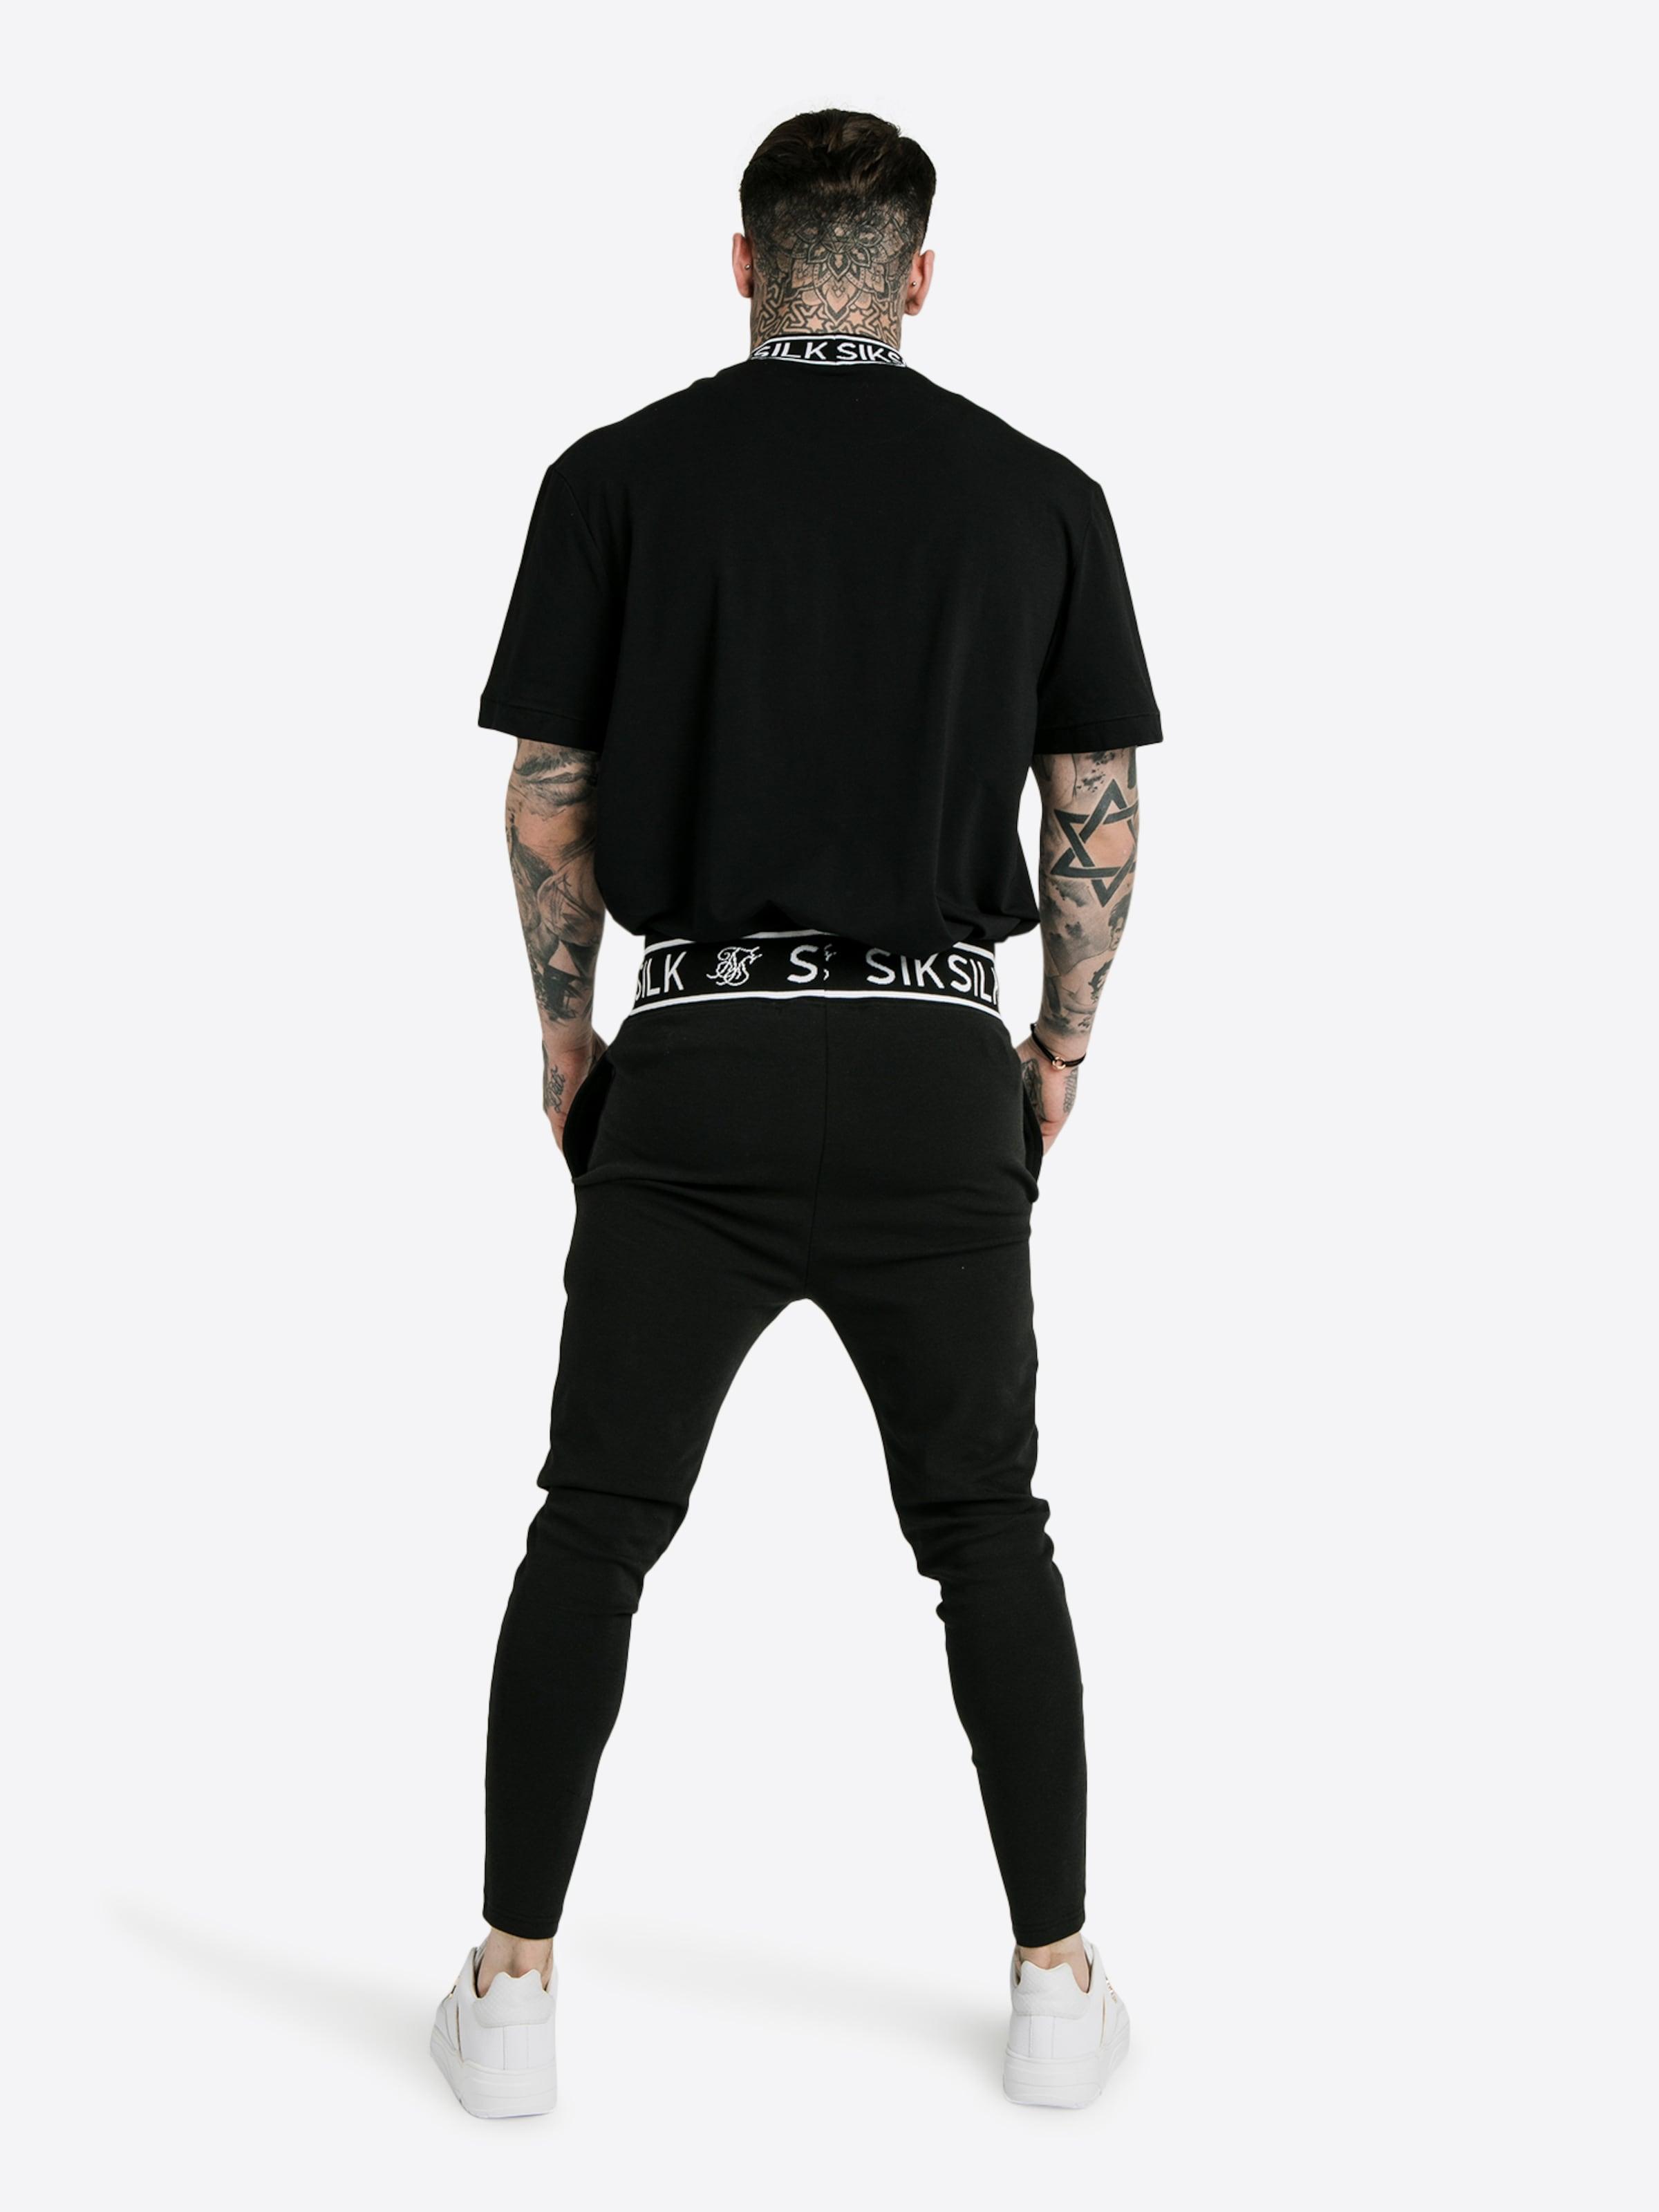 Dani Alves' 'siksilk shirt In Siksilk Schwarz T X zMjLqGUSVp